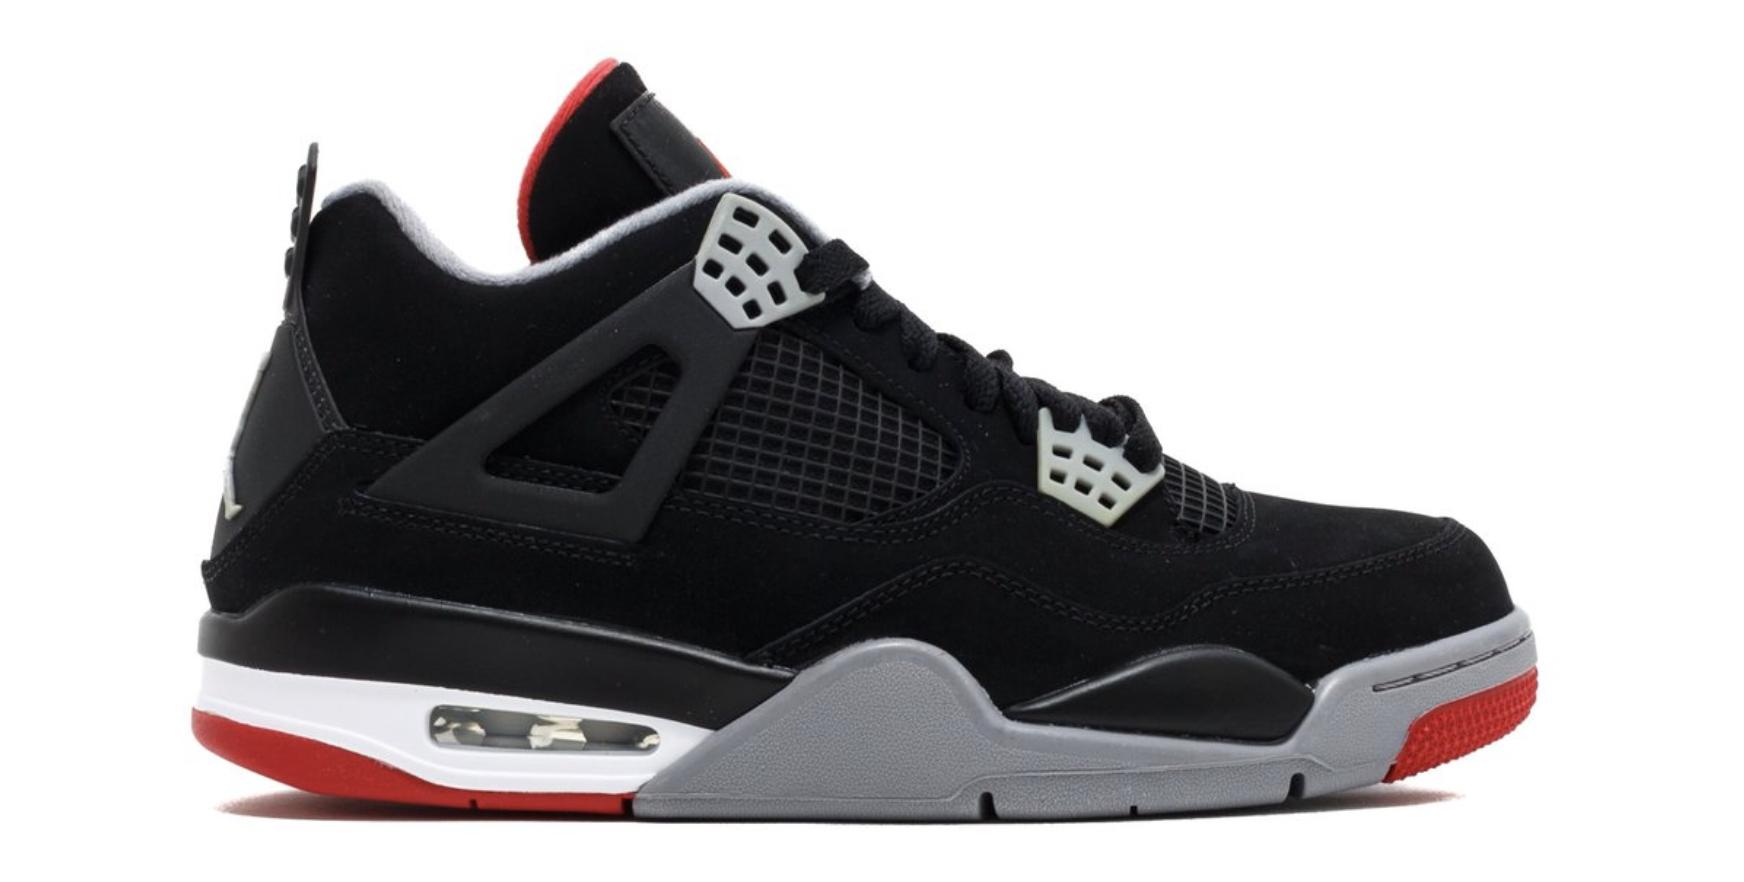 Air Jordan 4 'Bred' Rumored 2019 Release | Sole Collector